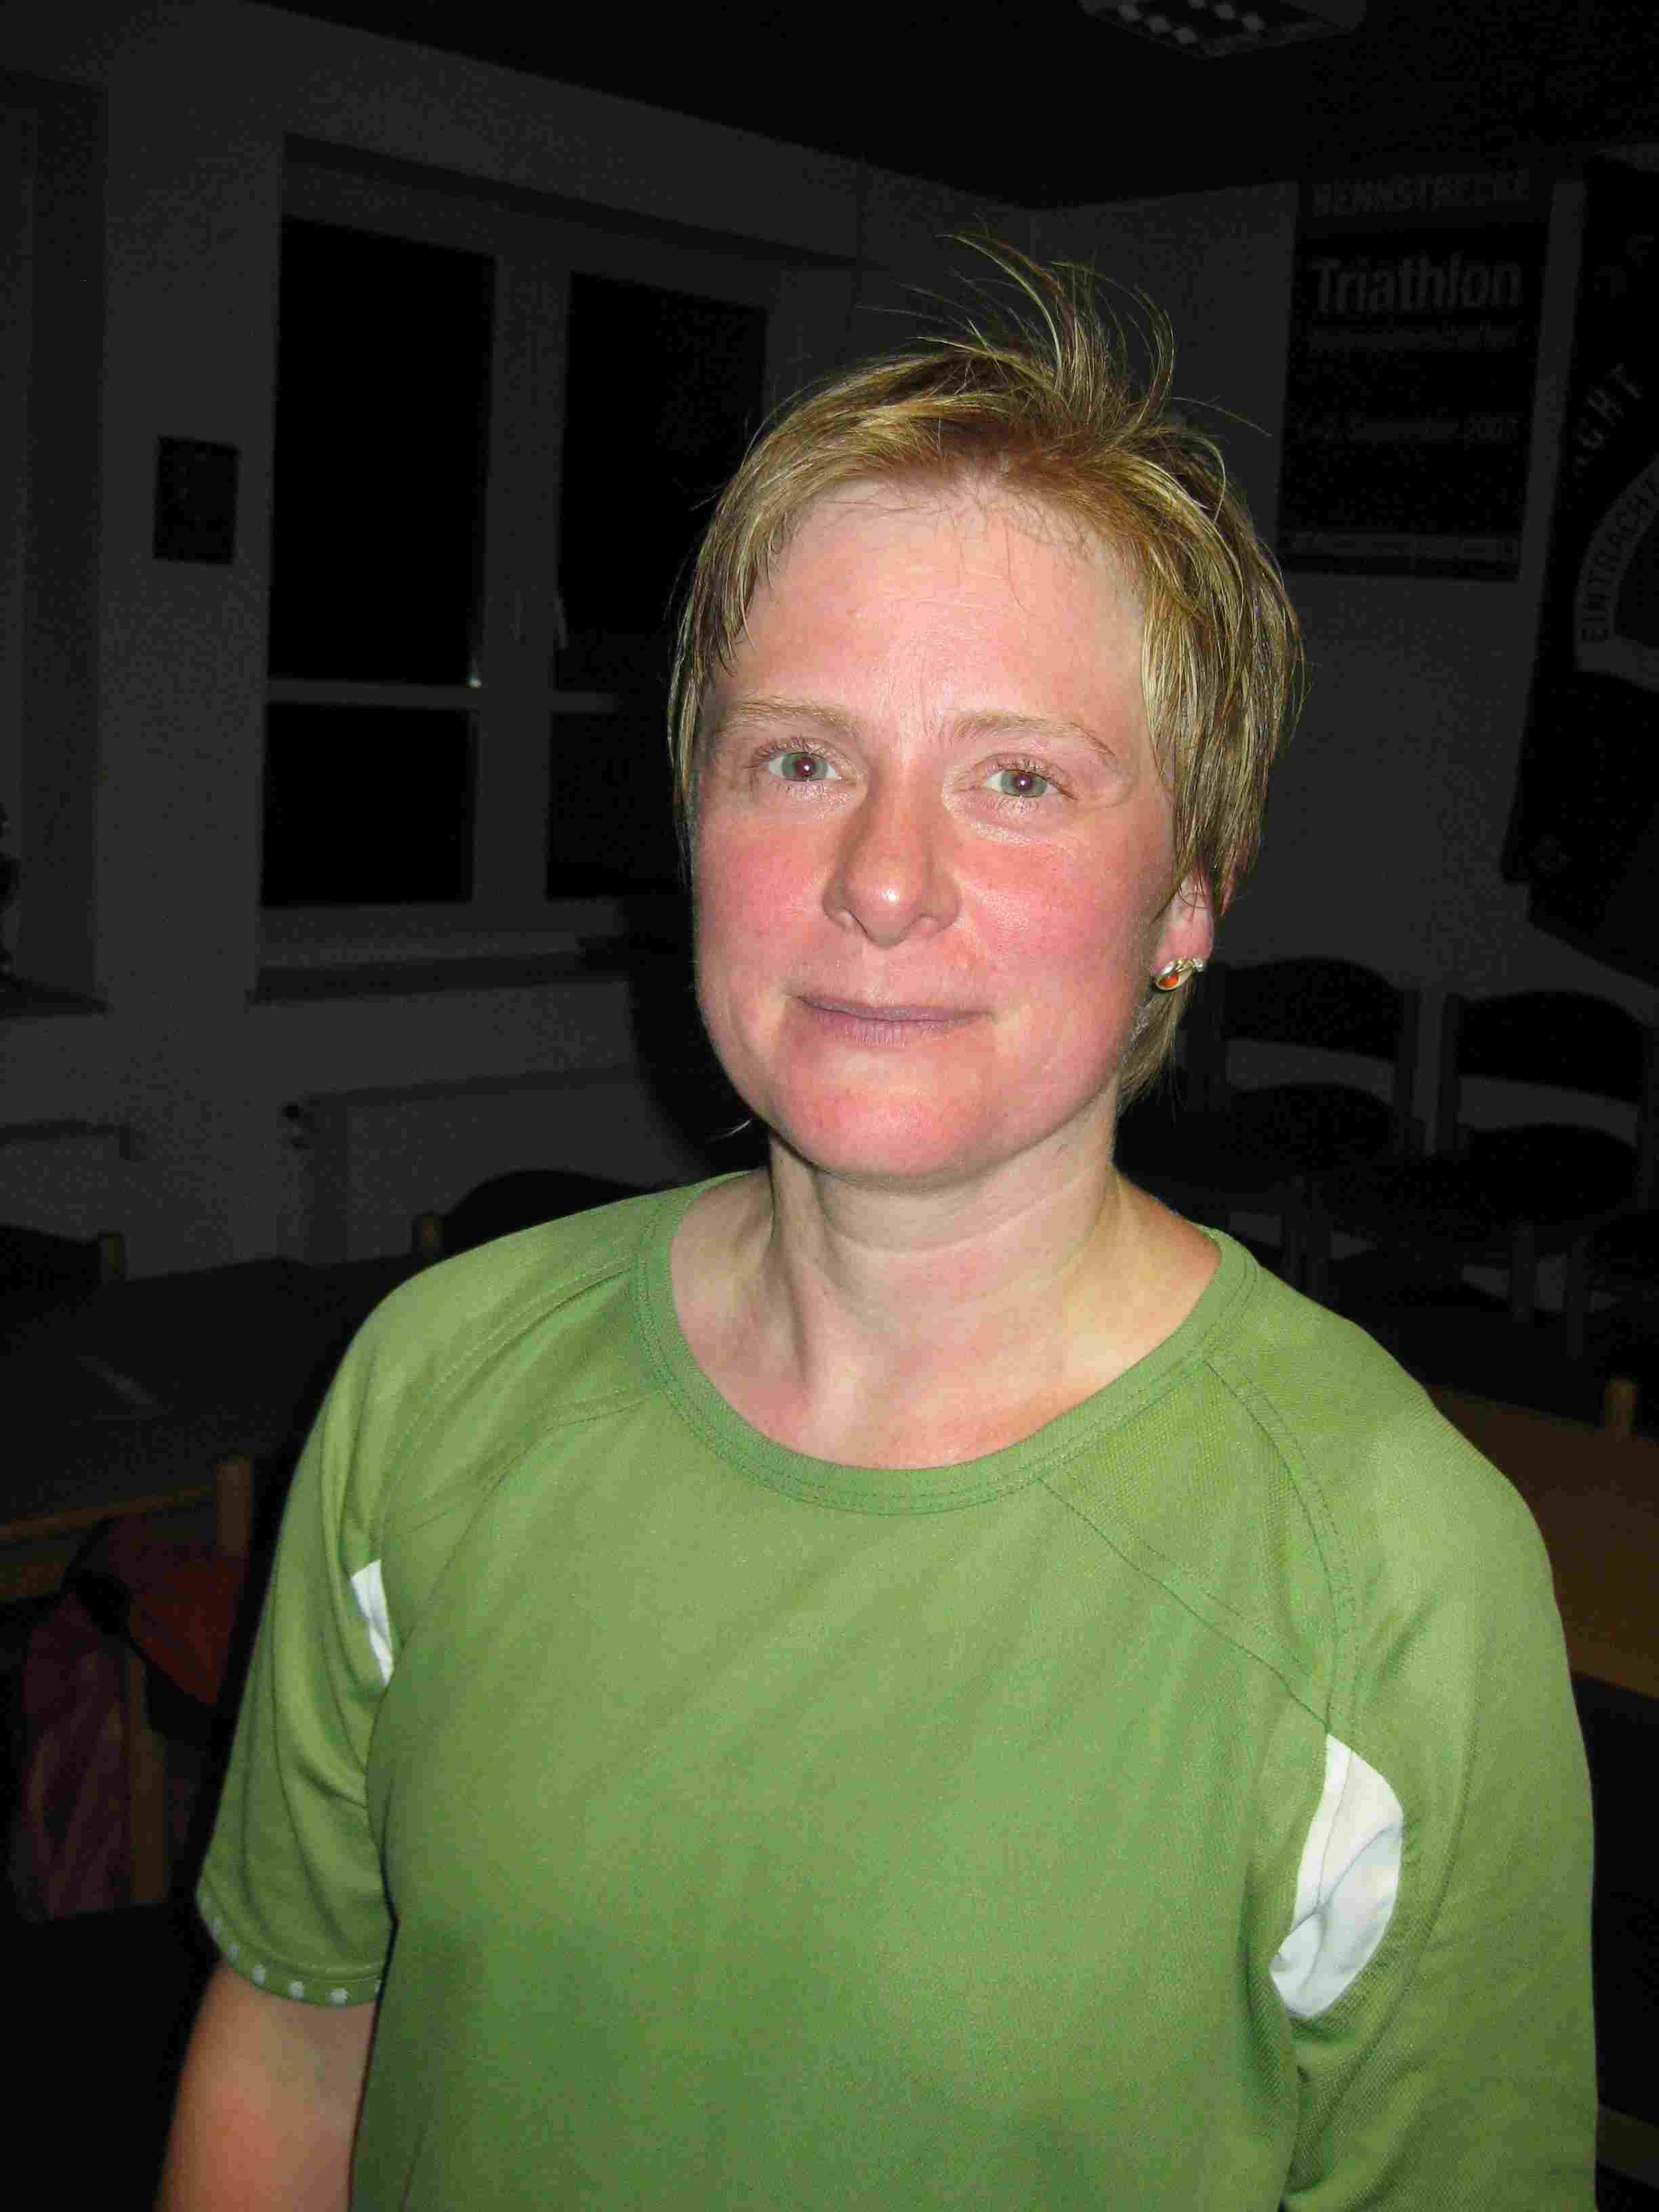 Janine Glinsmann